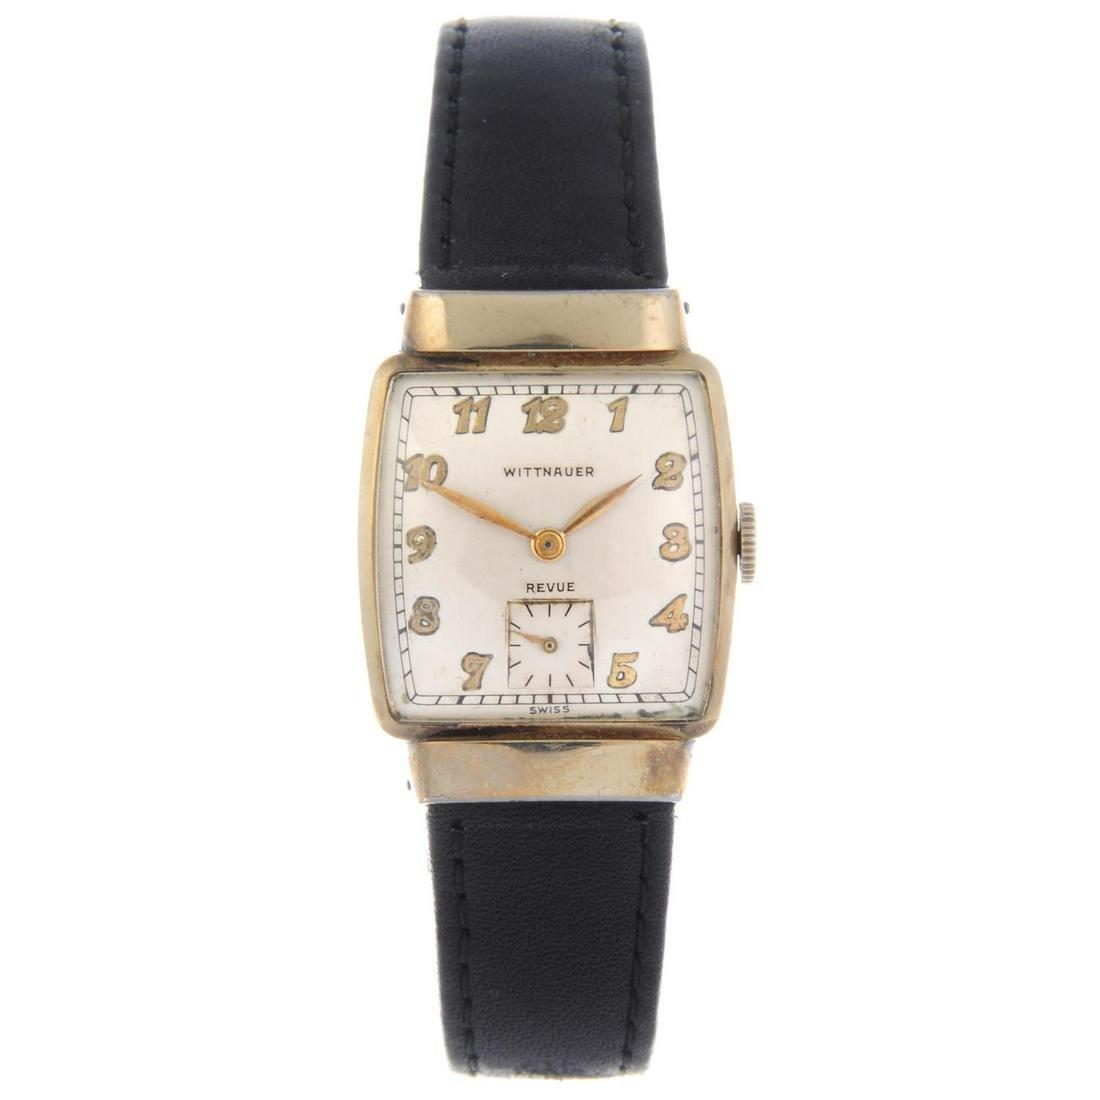 WITTNAUER - a gentleman's wrist watch. Gold filled